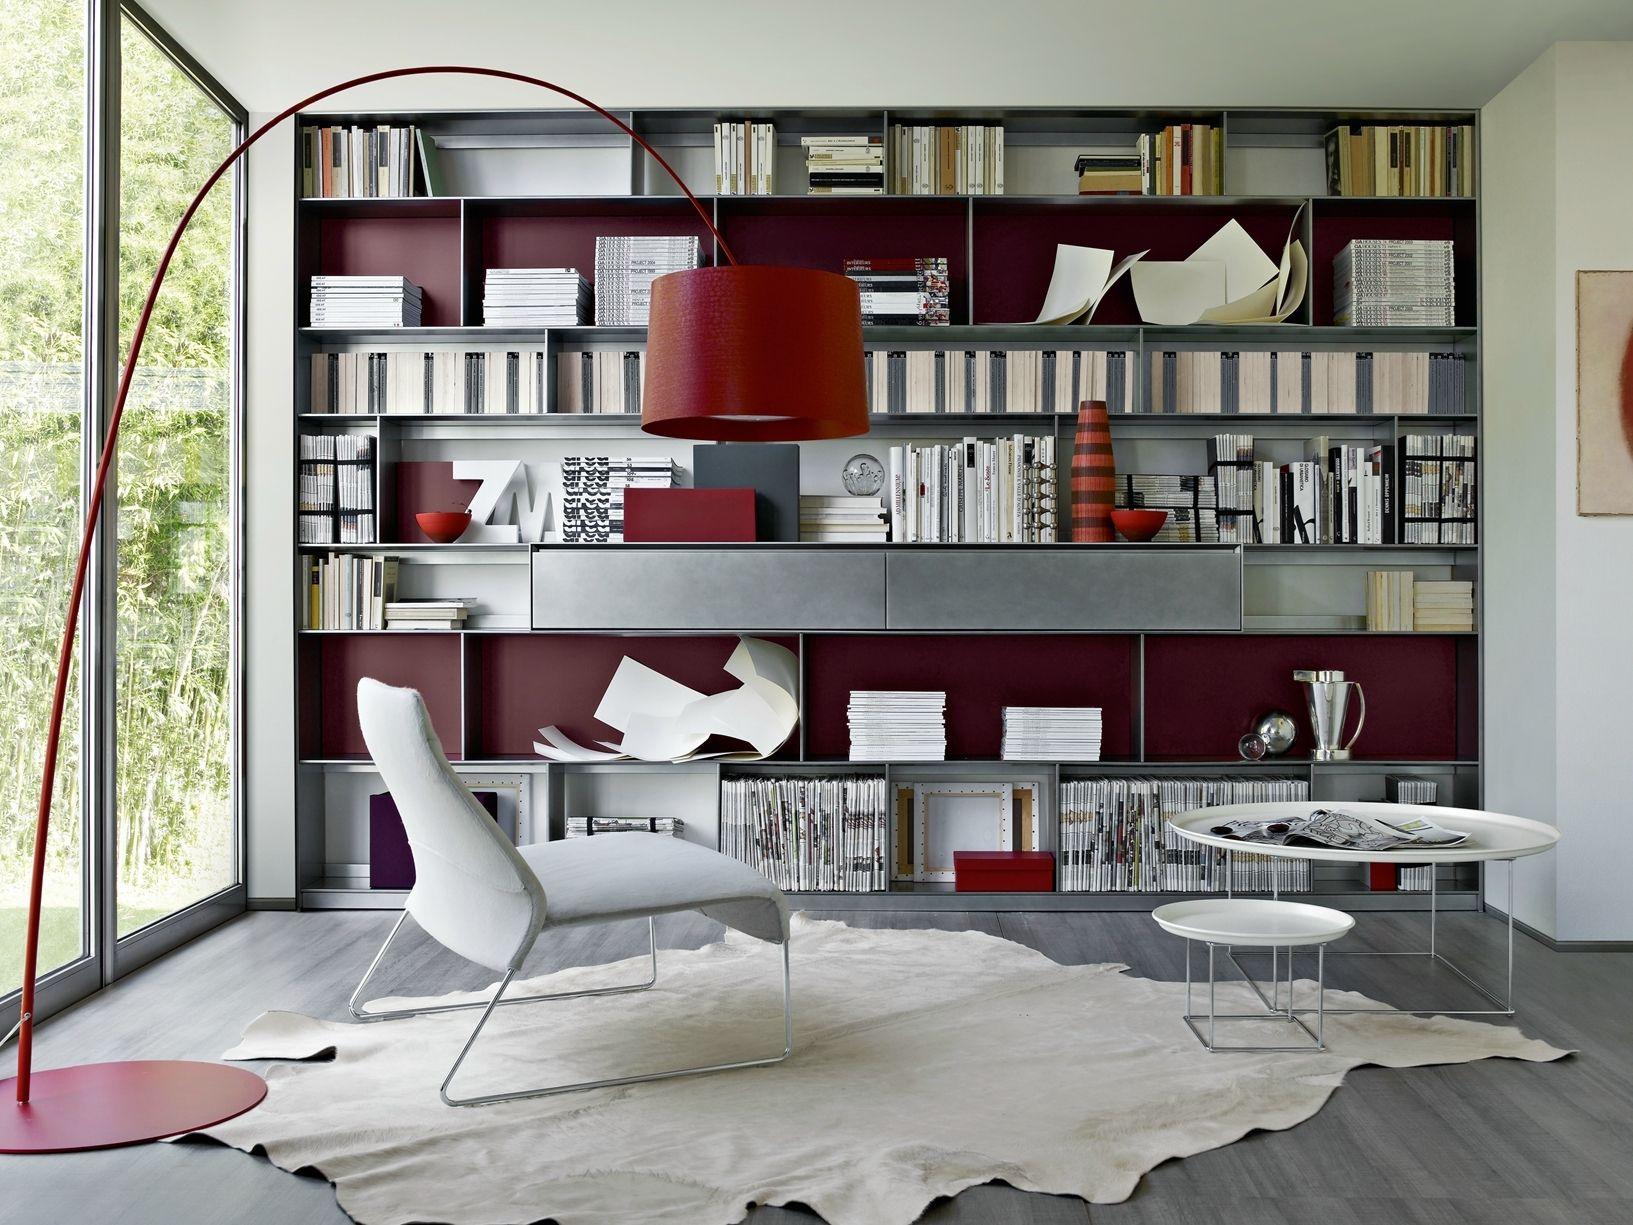 le novit indoor e outdoor di b b italia a imm cologne. Black Bedroom Furniture Sets. Home Design Ideas